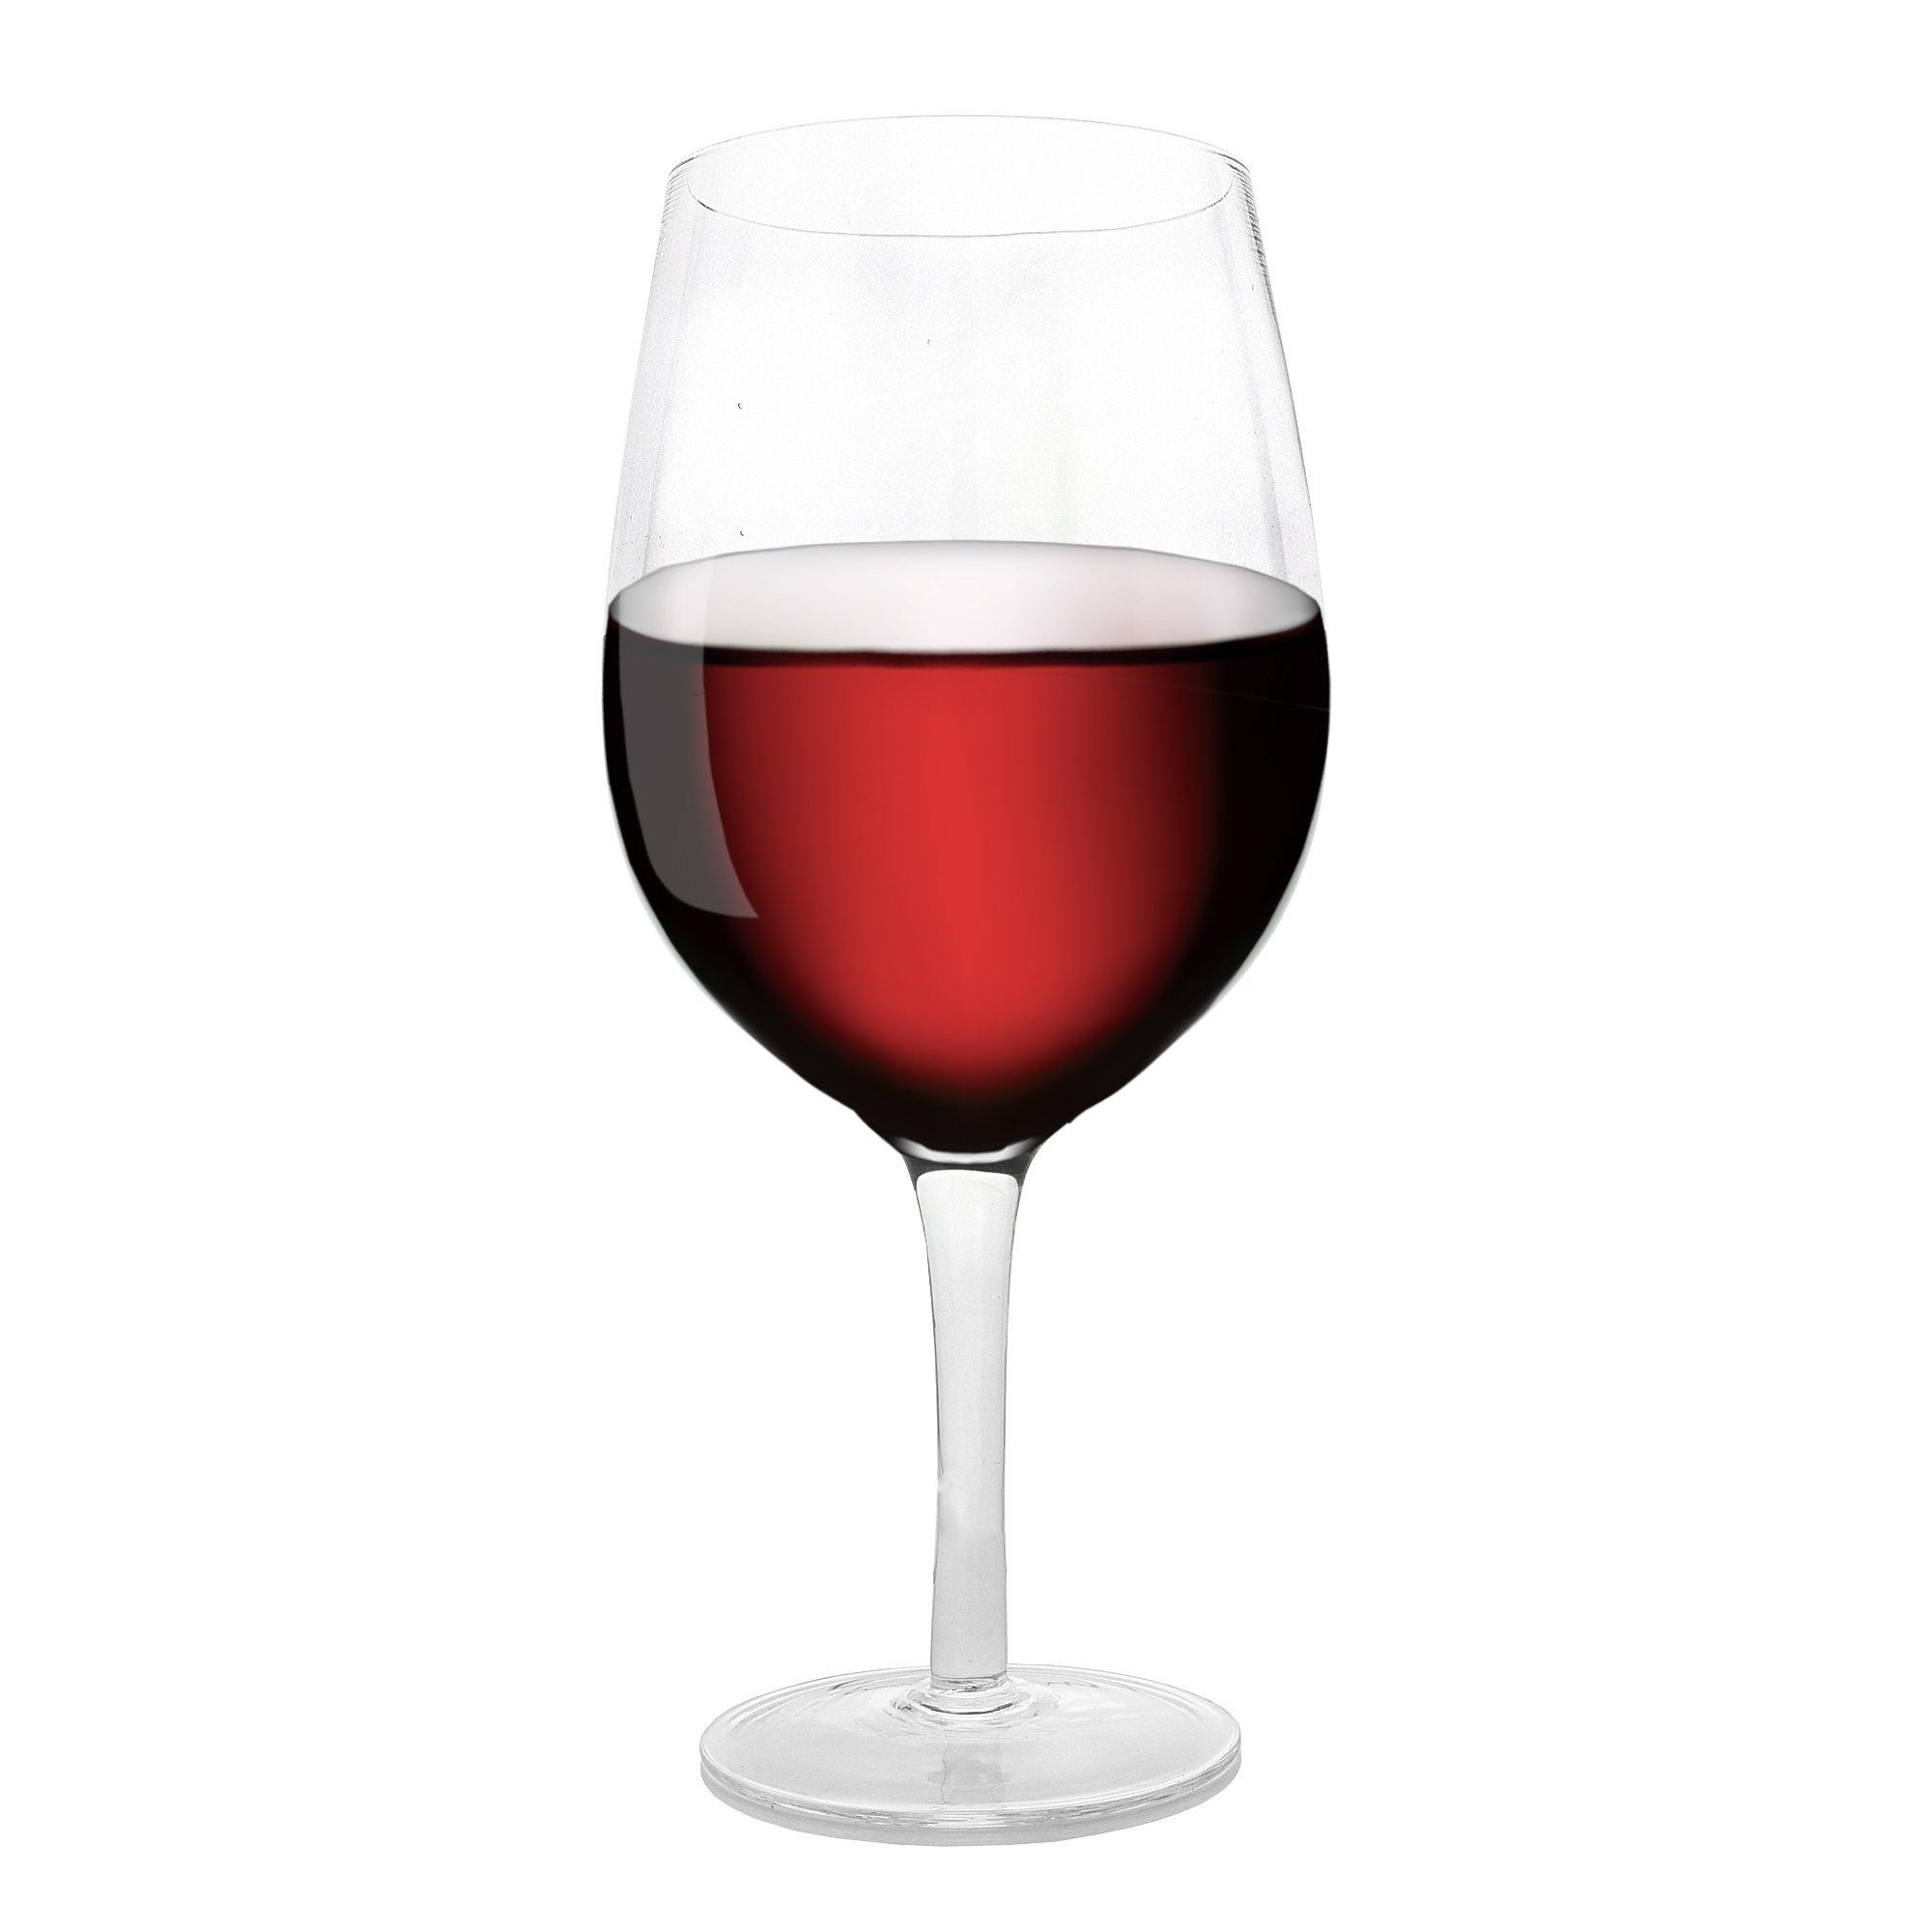 Kovot Giant Wine Glass Holds a Whole Bottle of